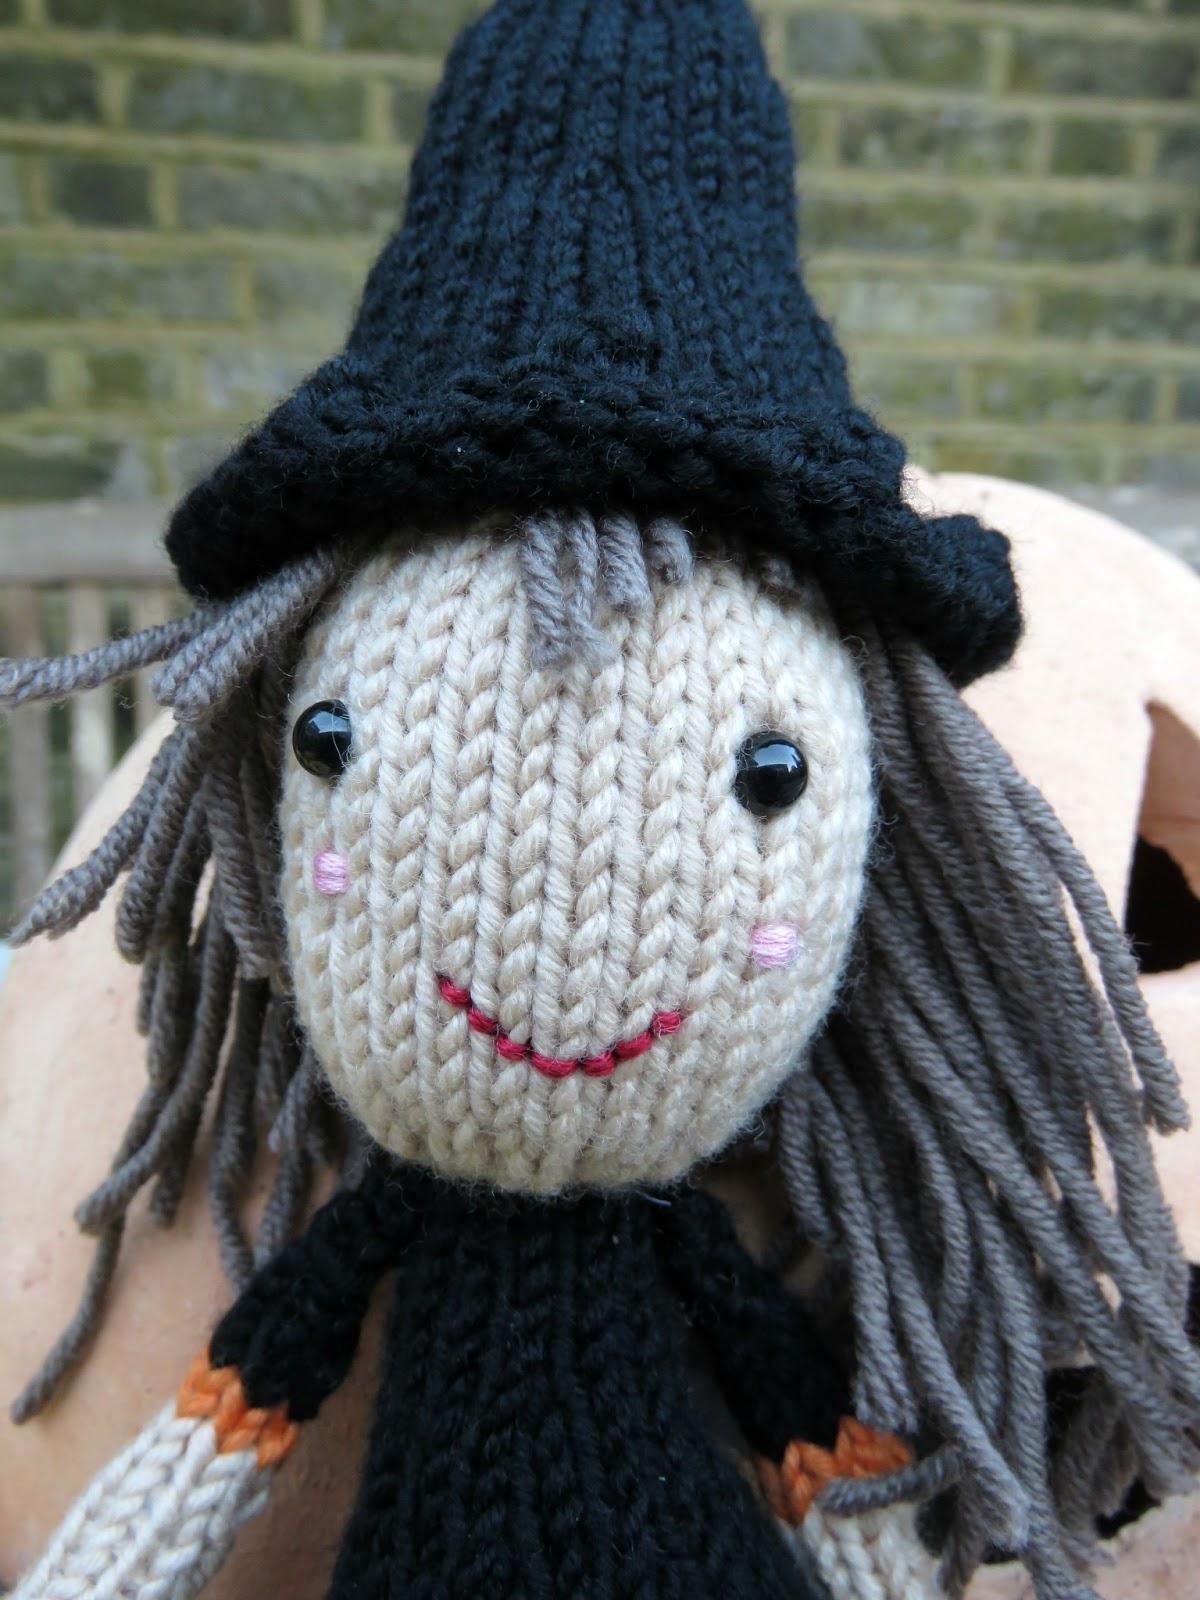 Costa Brava Knitting Holidays & Retreats: The bewitching Ms. Witch ...